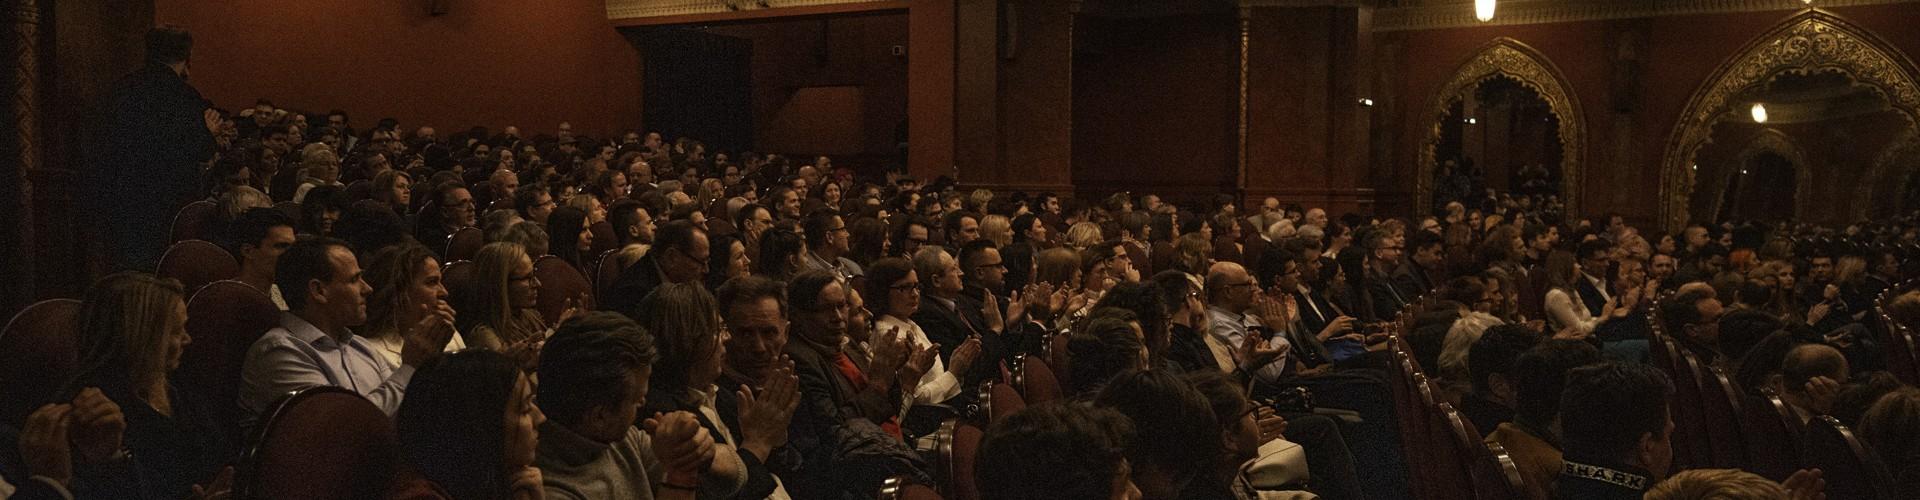 Legacy screening 1